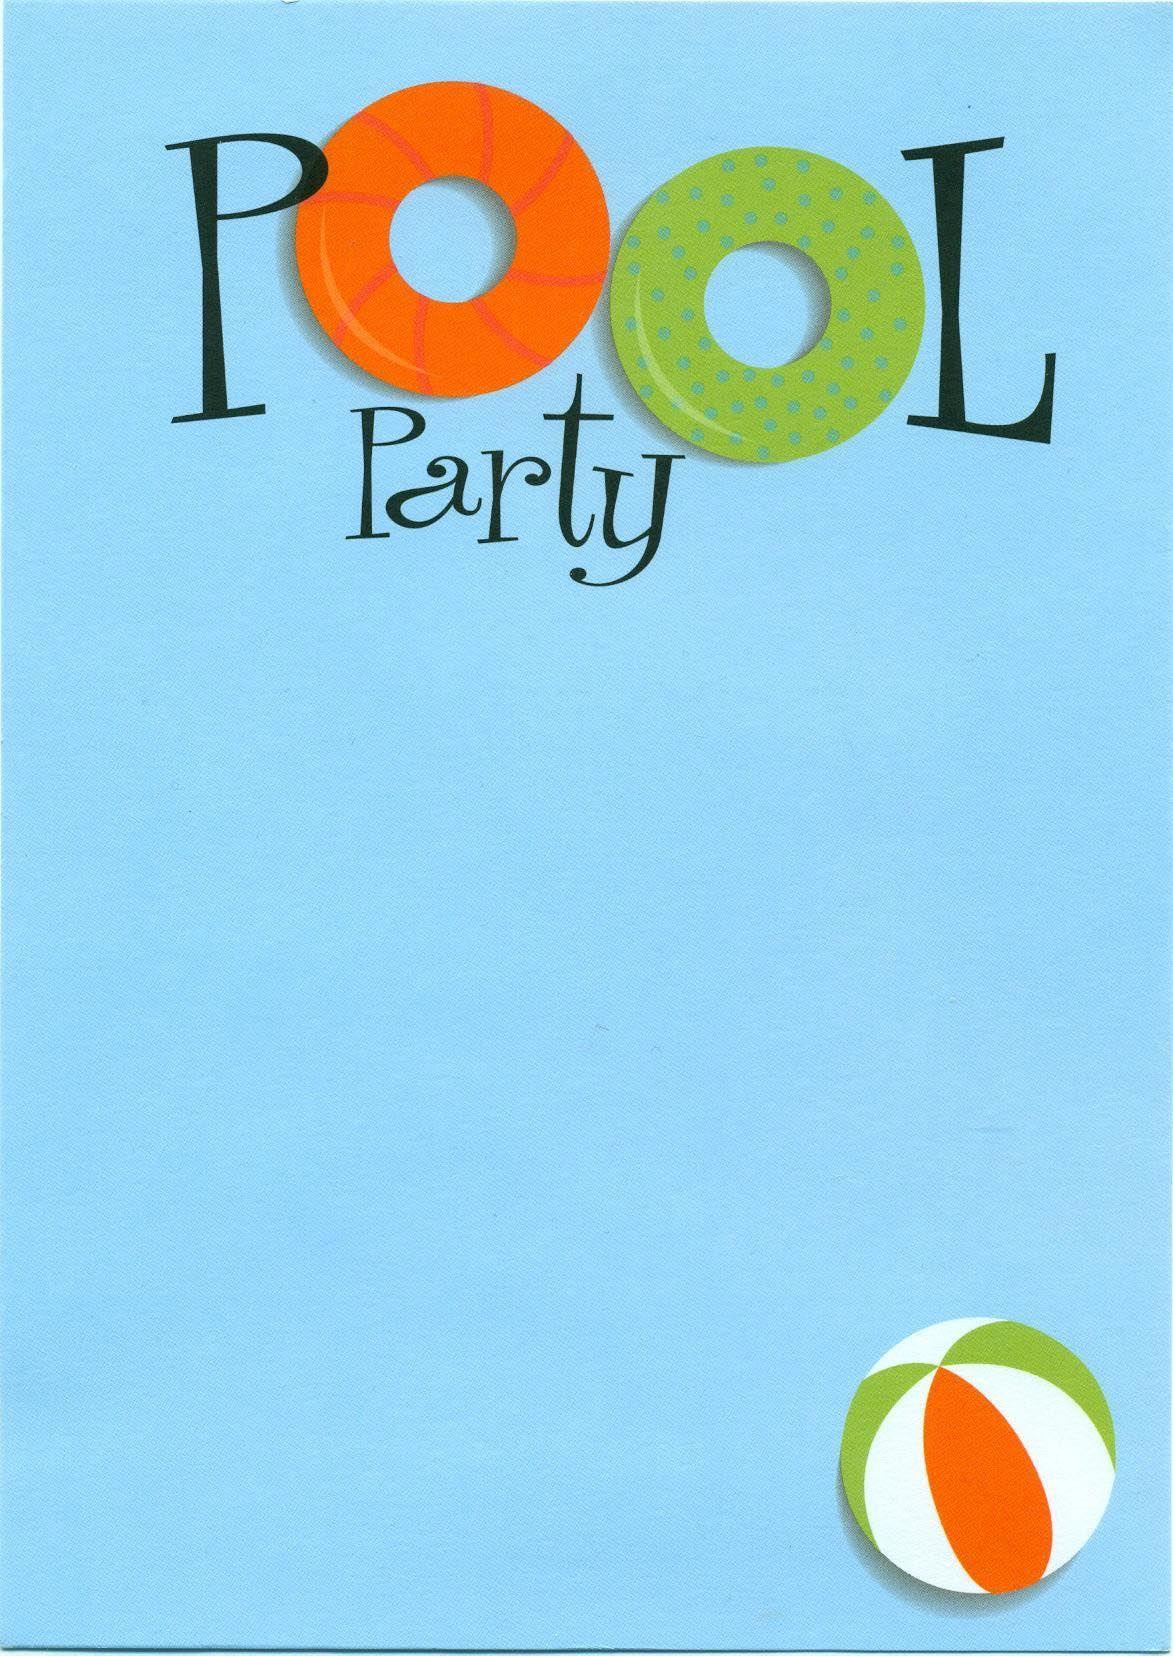 Pool Party Birthday Invitation | jax1st bday | Pinterest ...